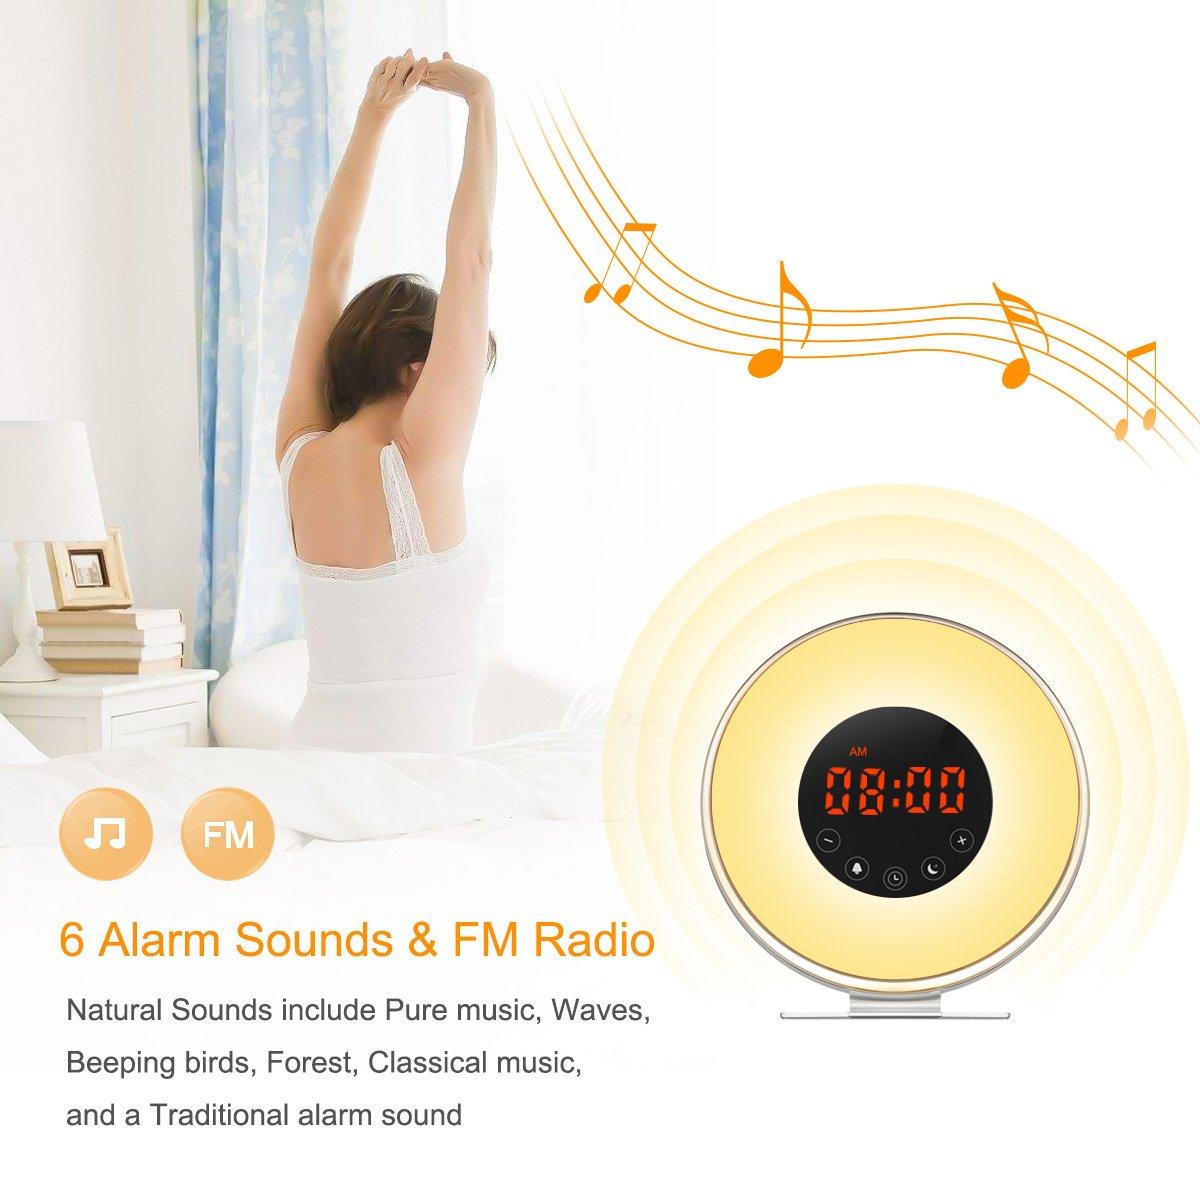 Despertador Luz Amanecer-Radio FM/Función Snooze/7 Luces Colores/6 Melodías-Reloj Despertador Digital (Negro)